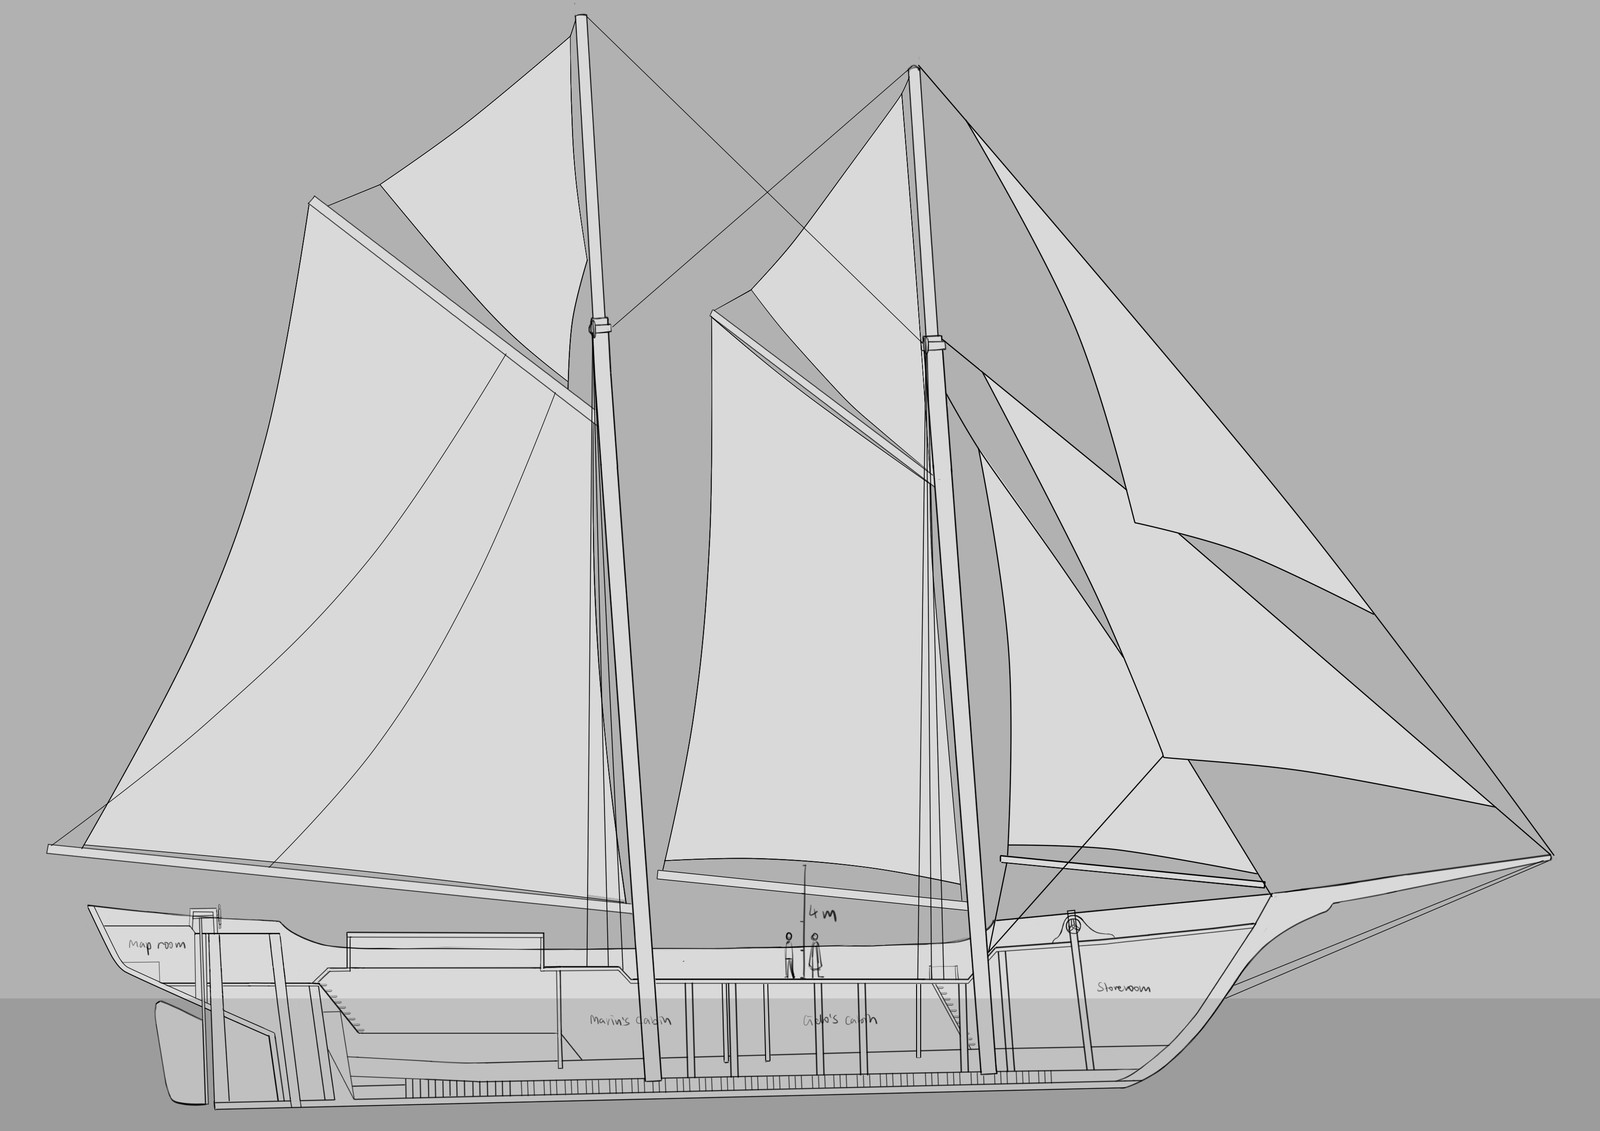 Ship layout.